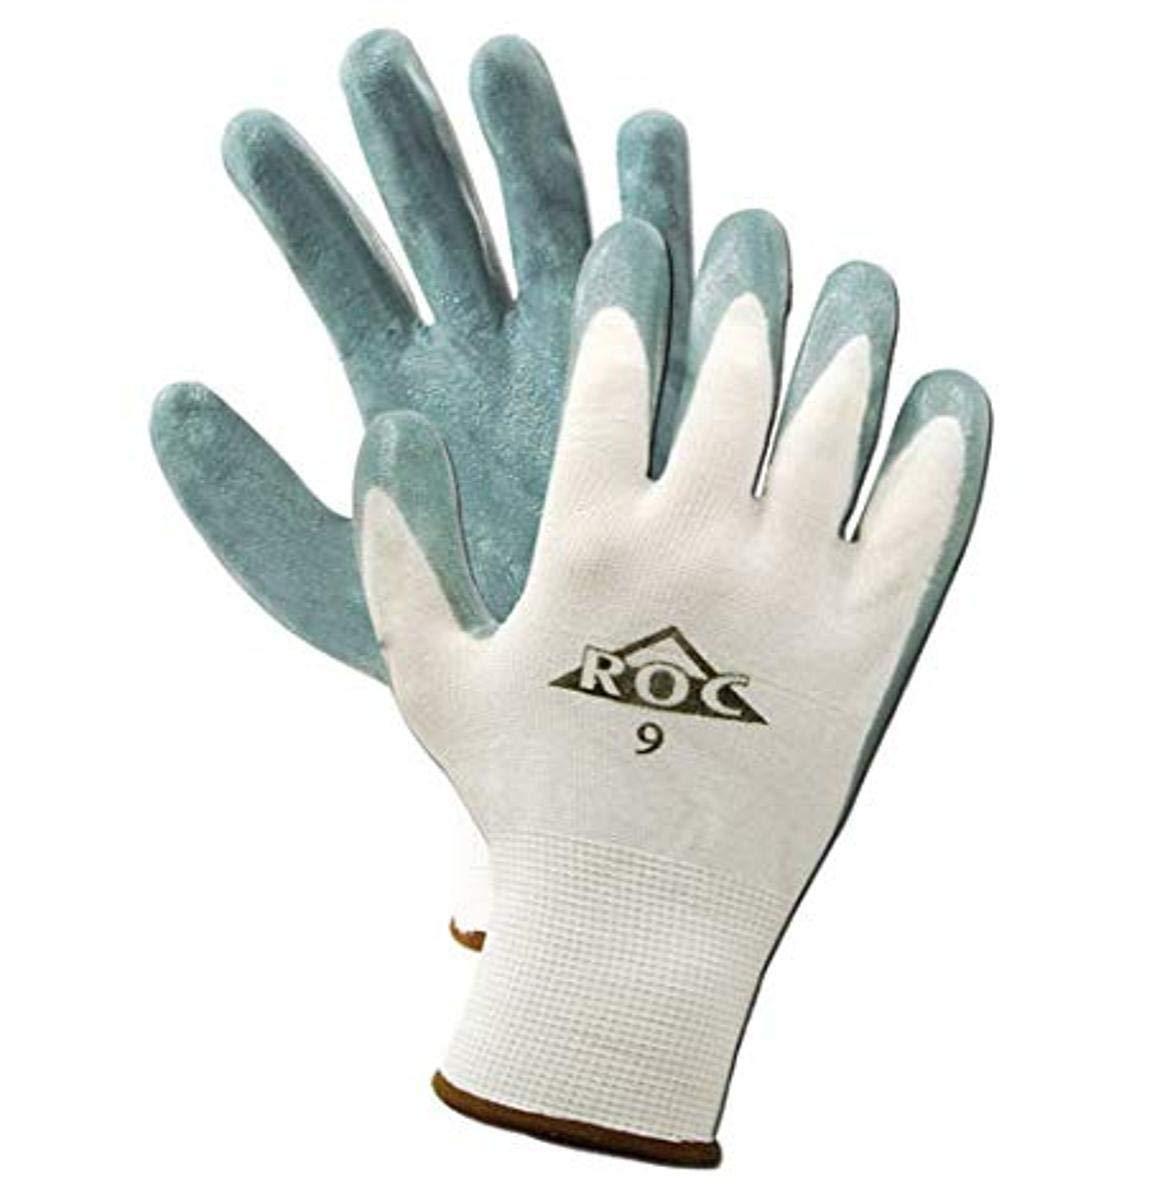 MAGID ROC GP560 Nylon Glove, Gray Foam Nitrile Palm Coating, Knit Wrist Cuff, 9